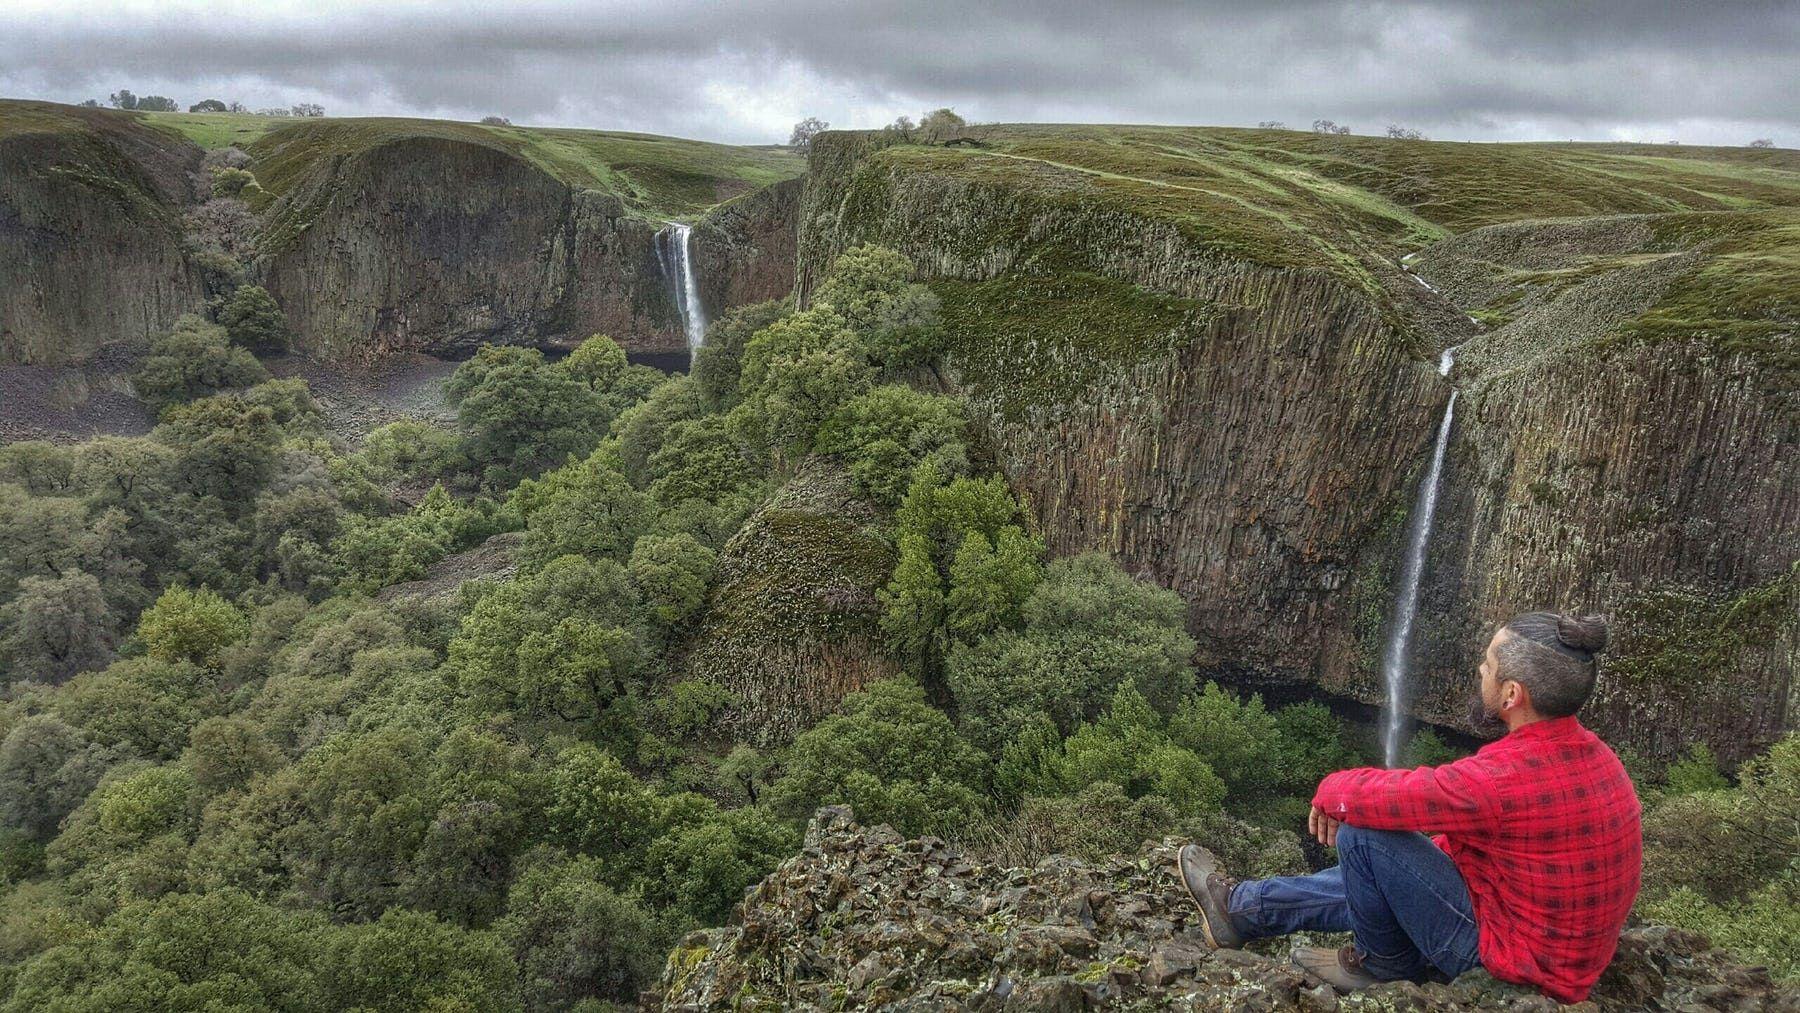 Hike to phantom falls california waterfalls places in